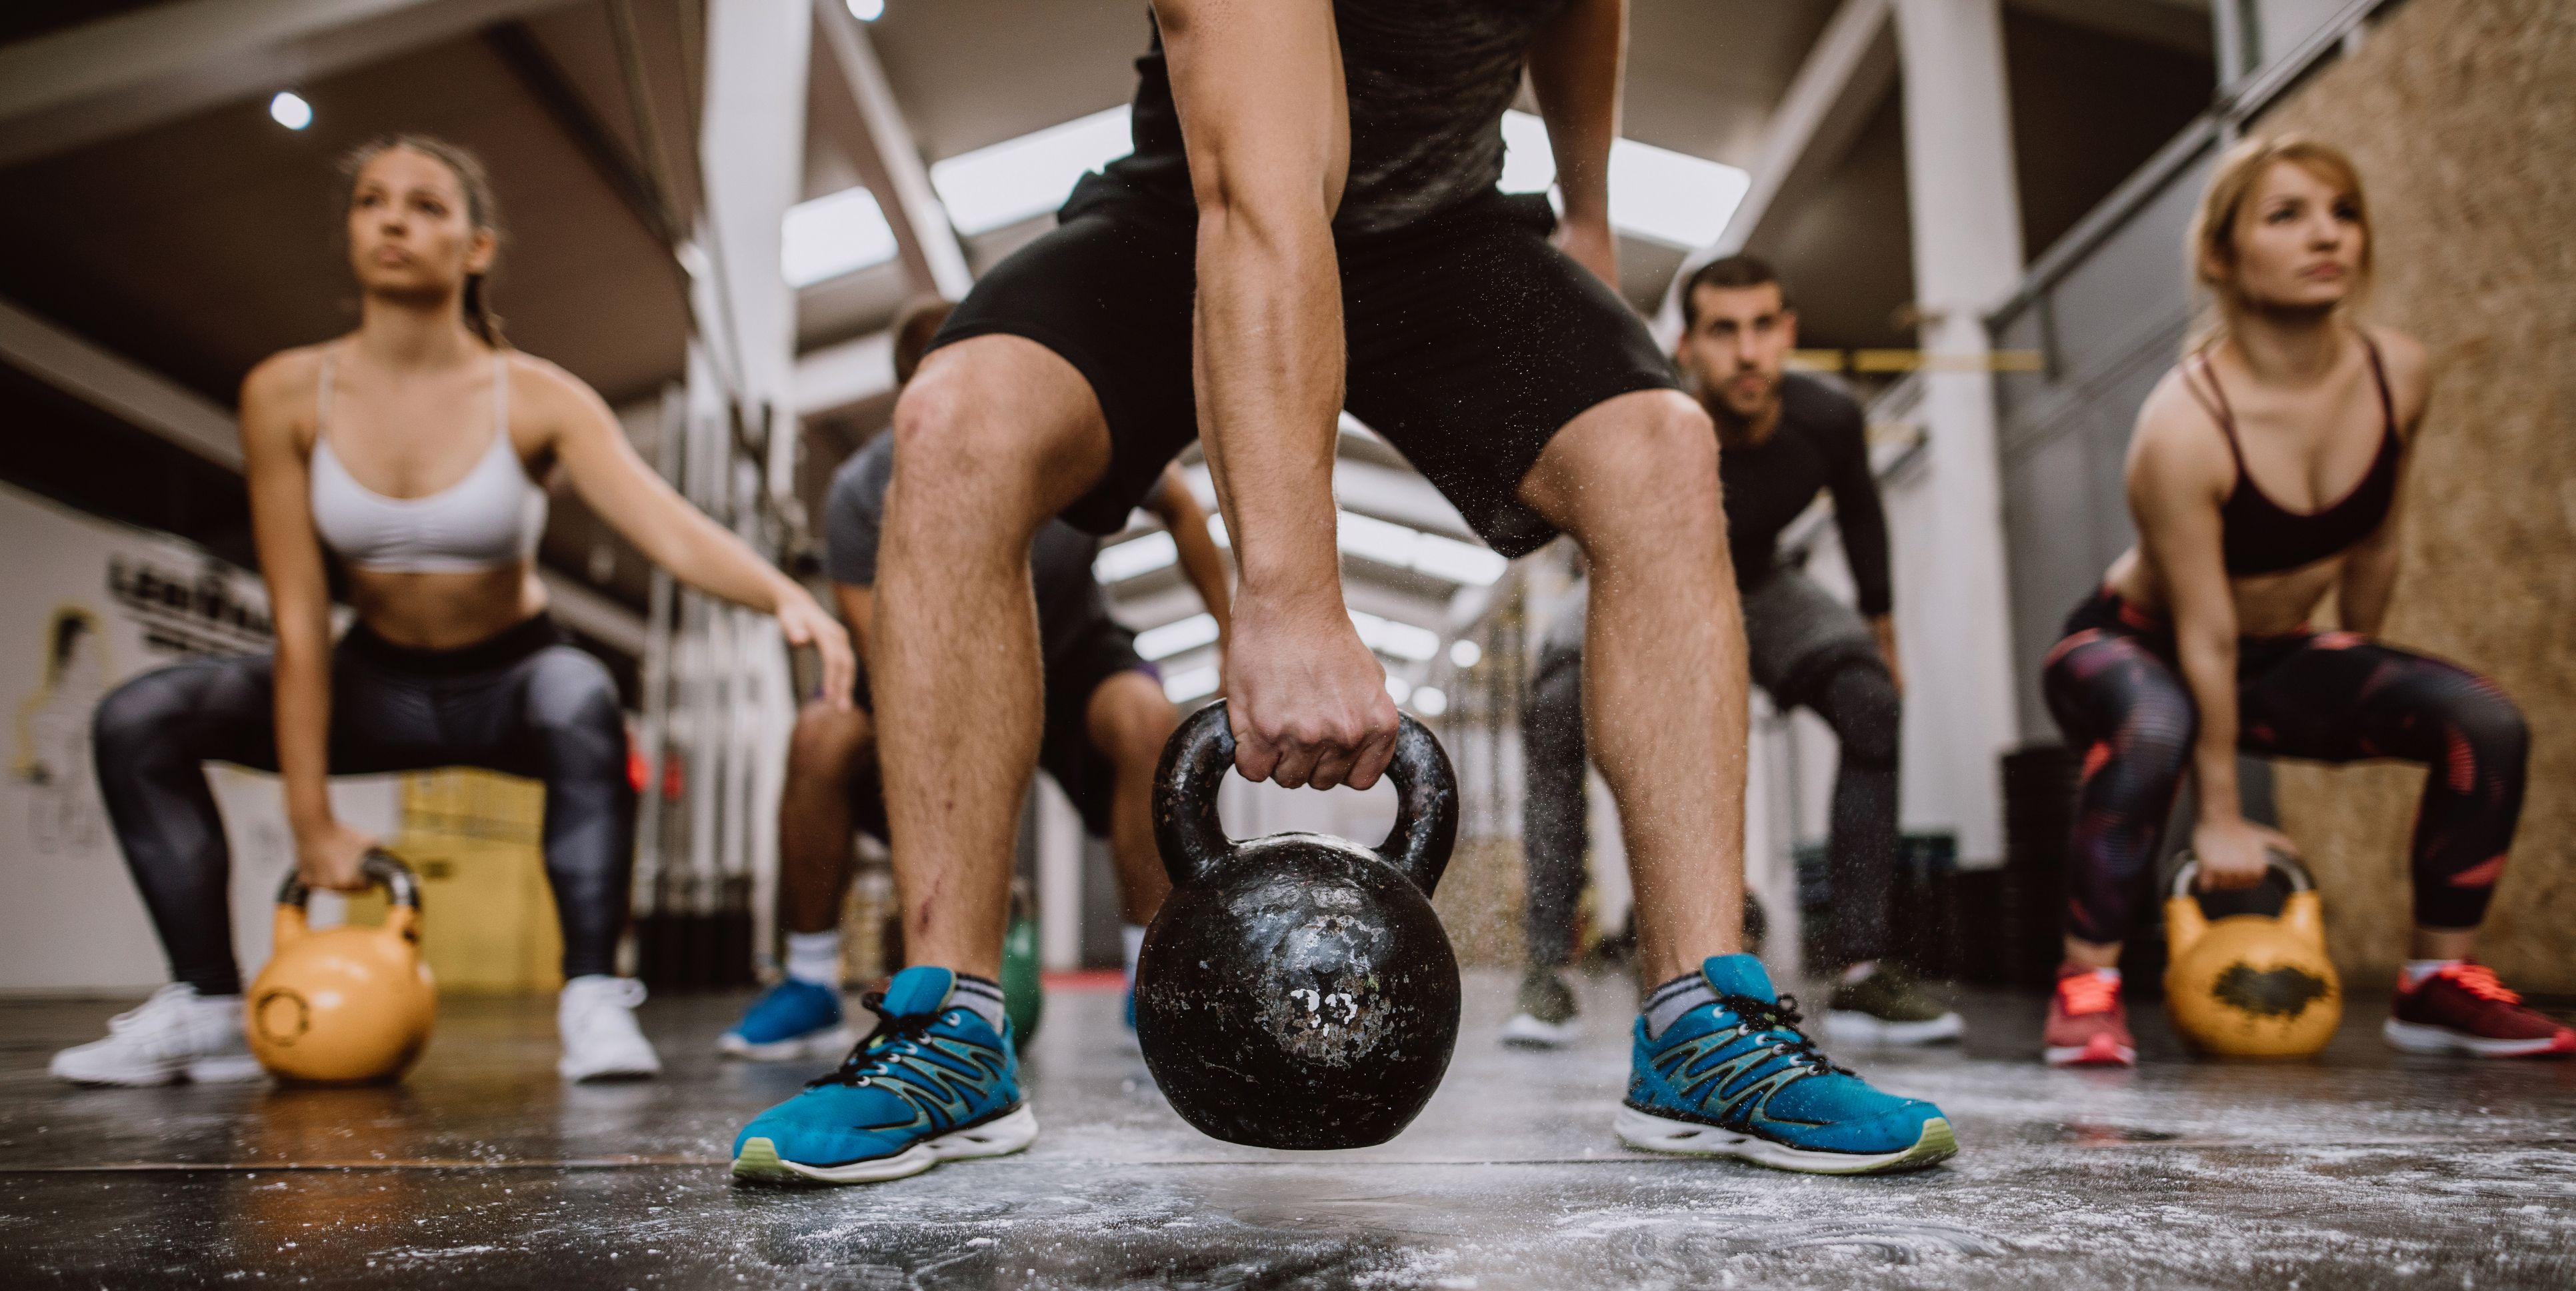 Impressive Workout